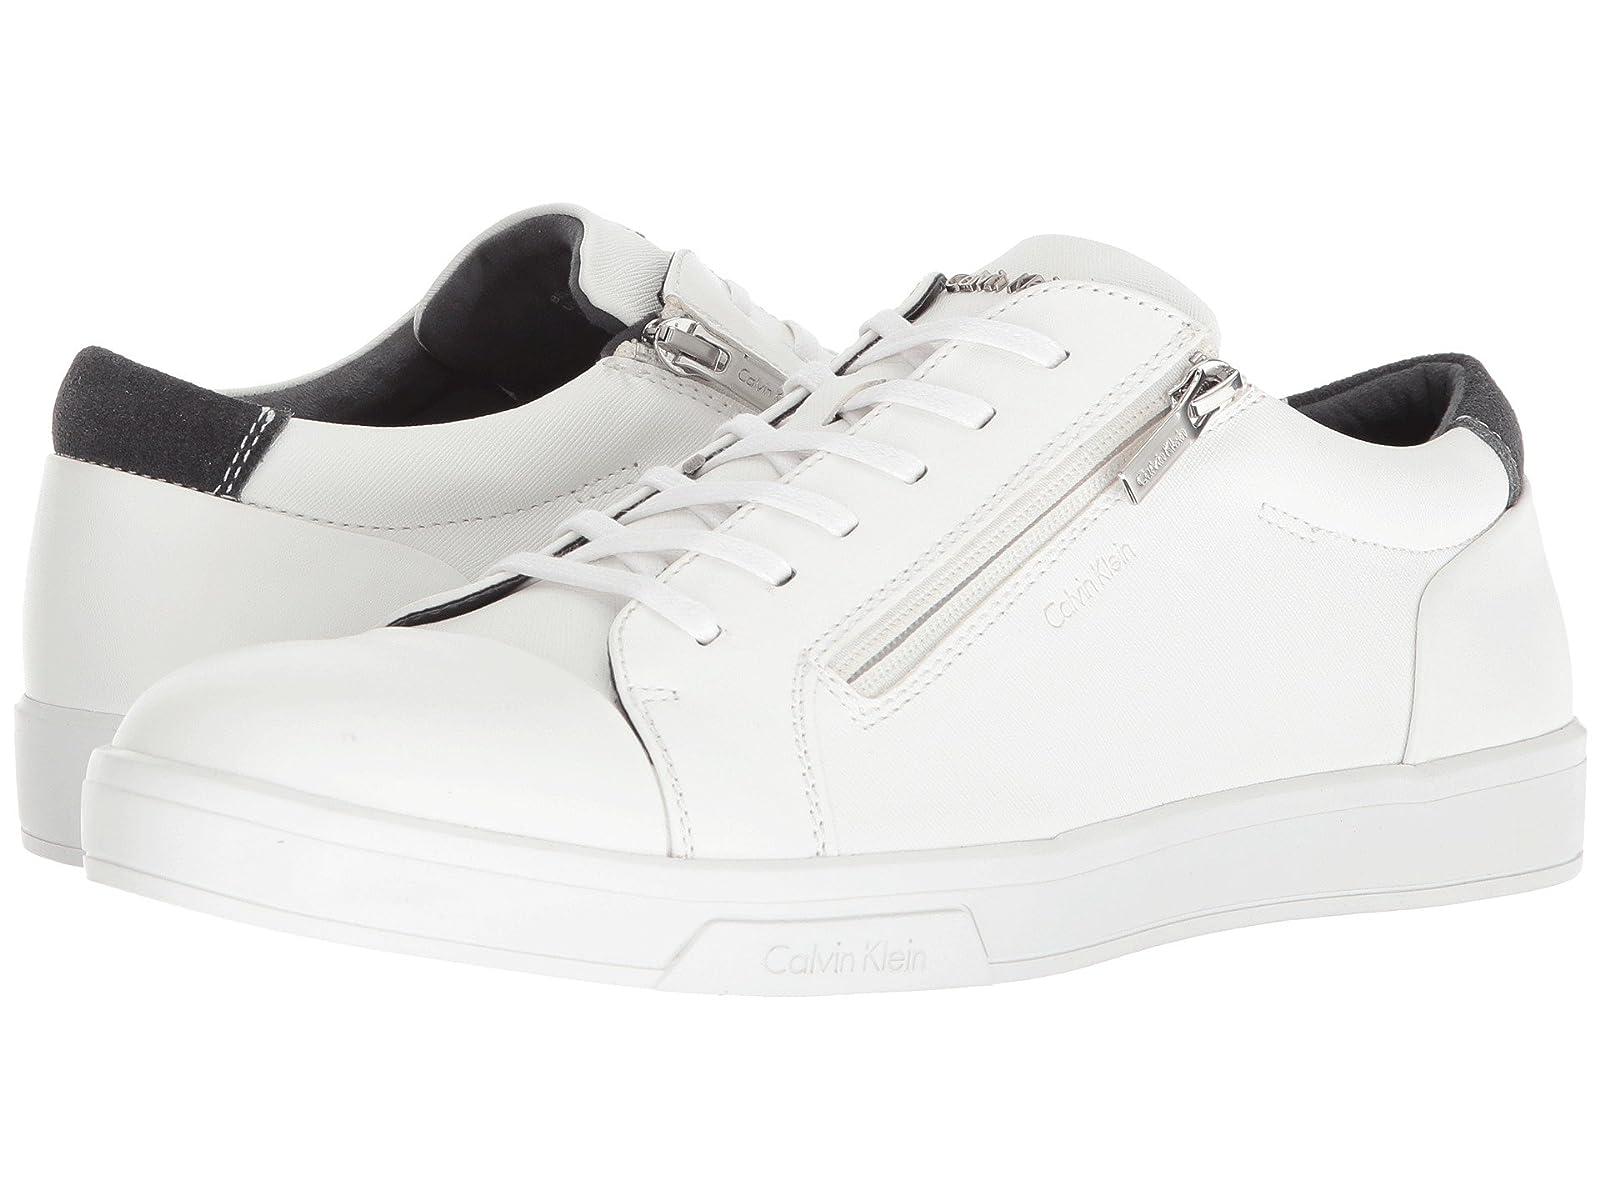 Calvin Klein BealeCheap and distinctive eye-catching shoes